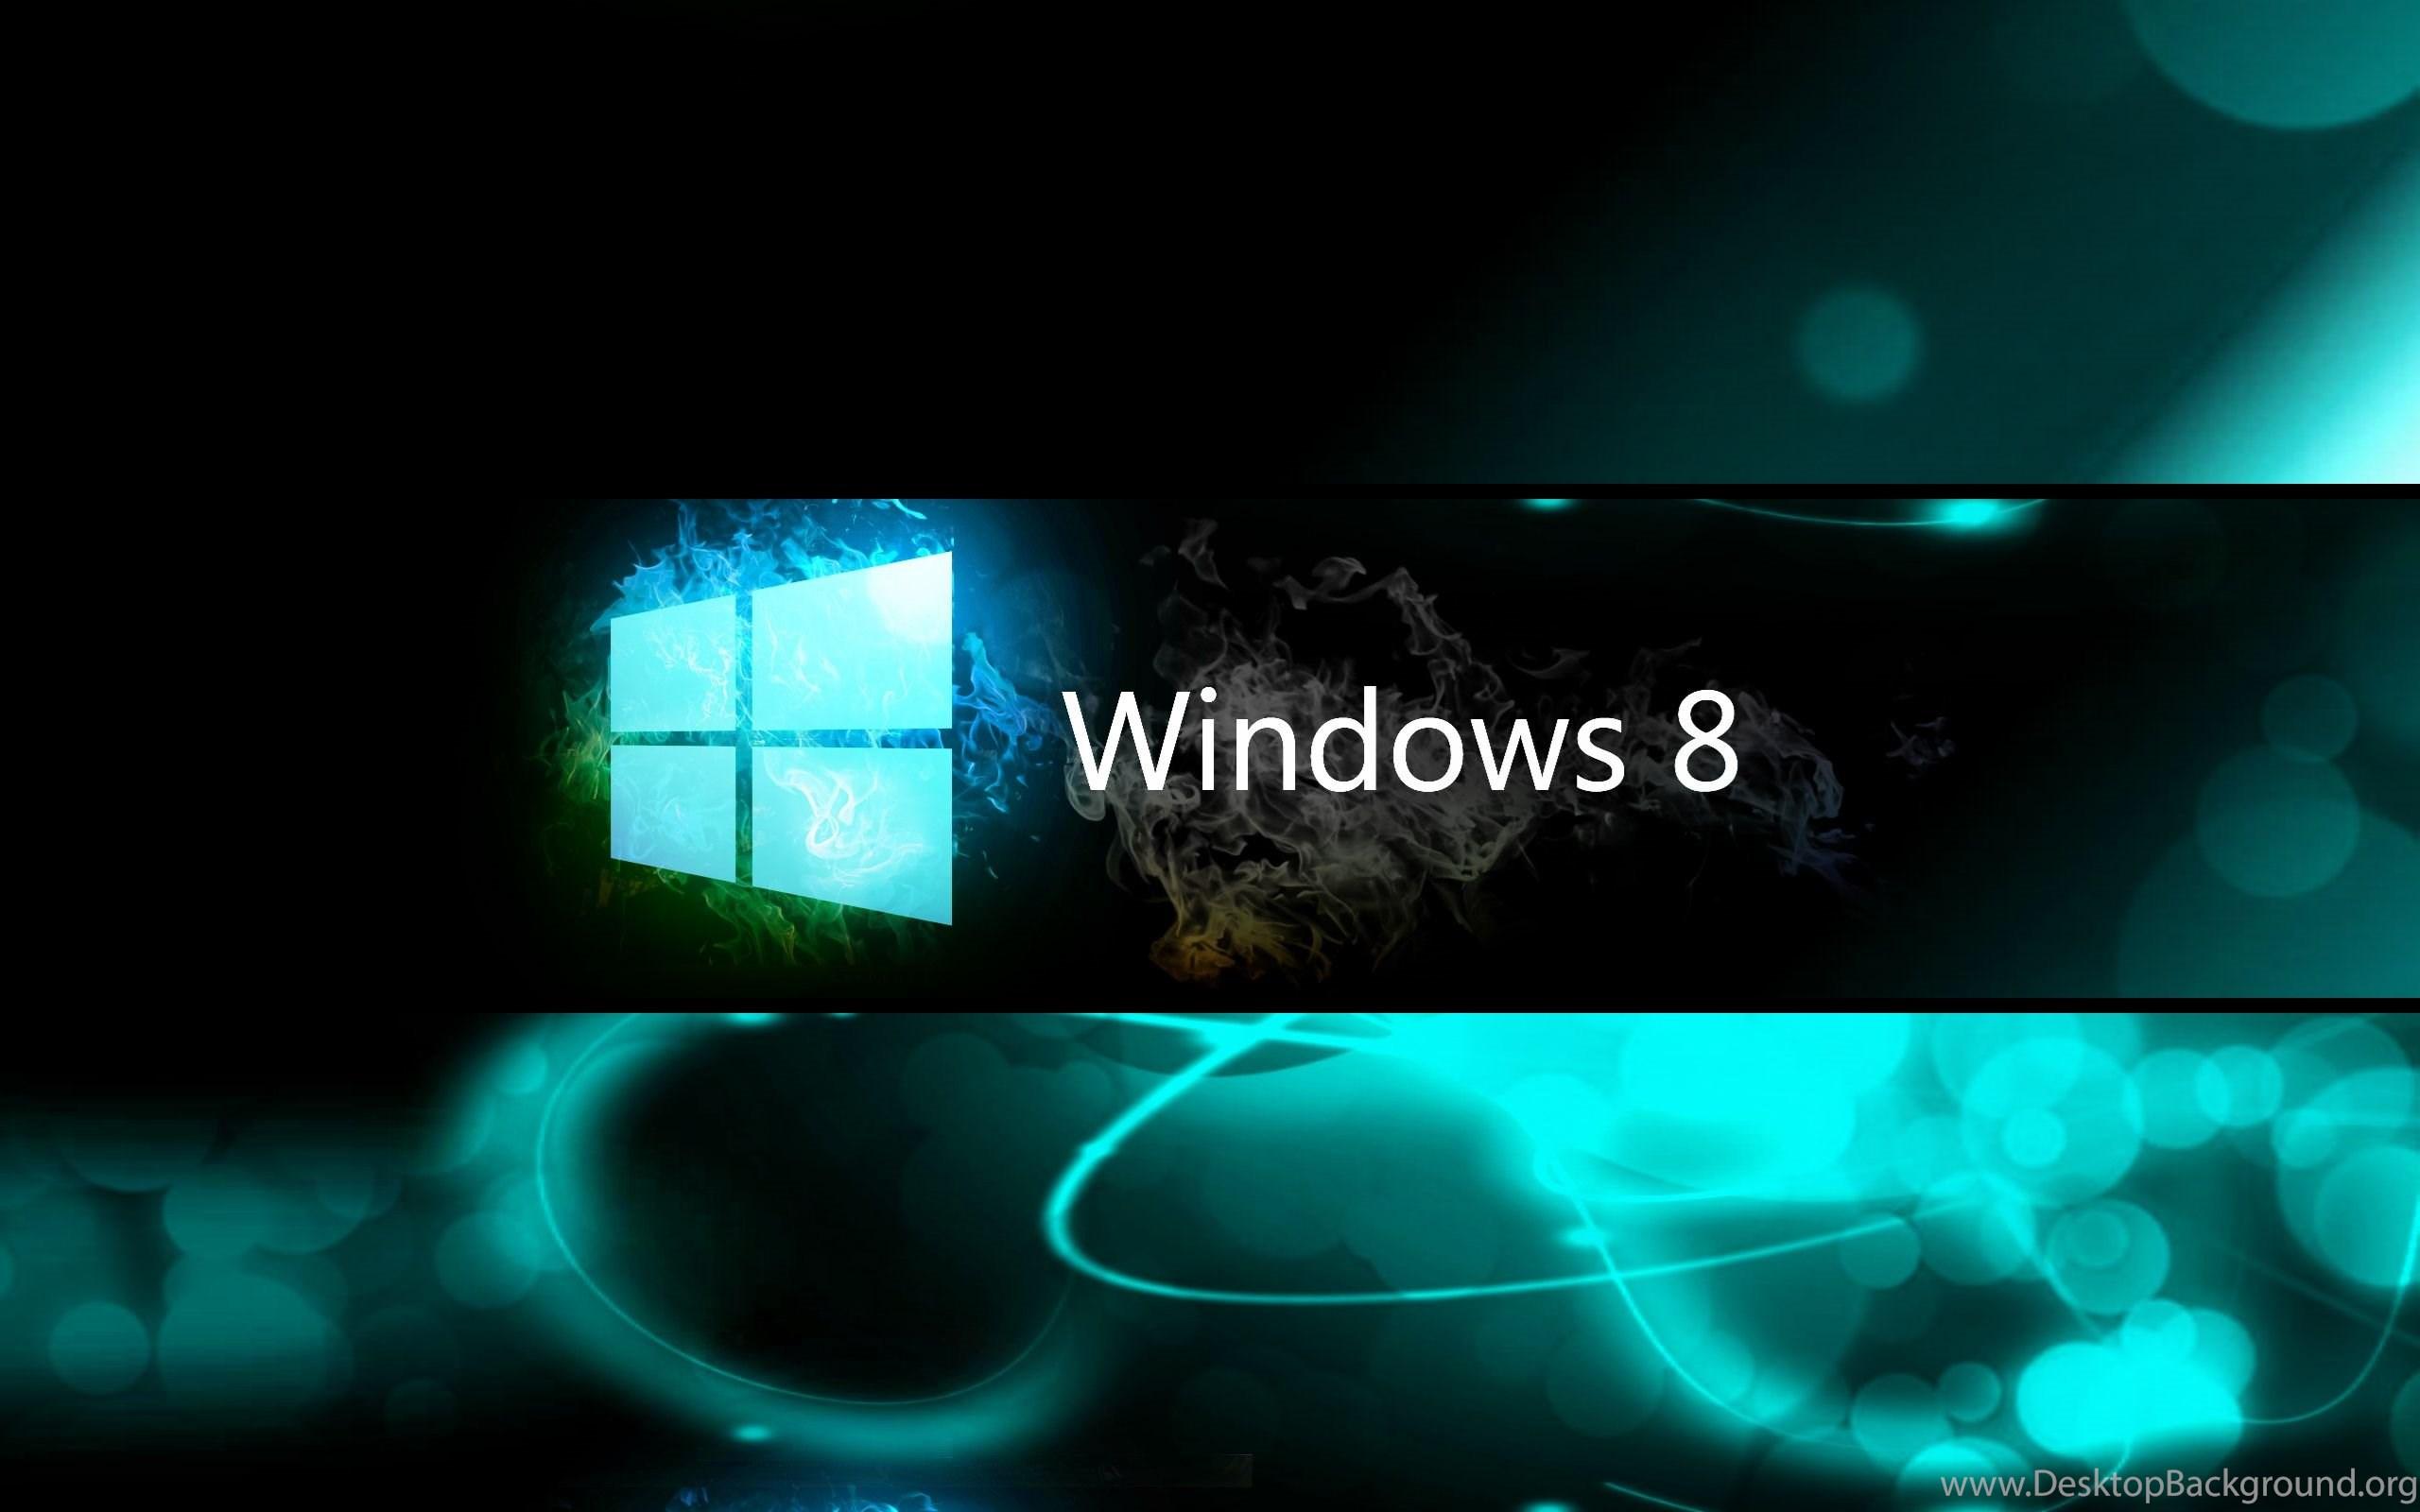 Best Windows 8 Hd Wallpaper Jpeg Desktop Background